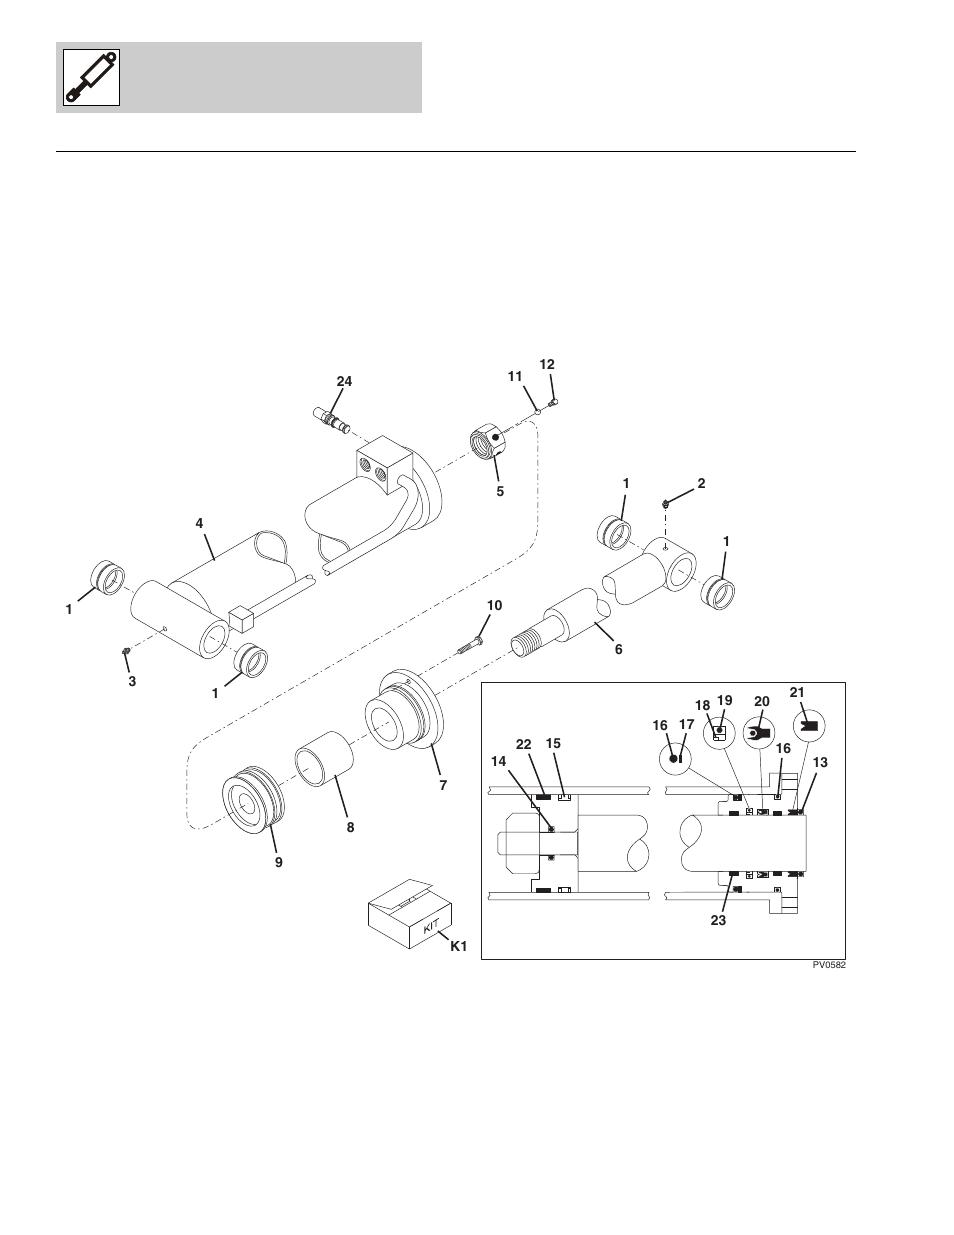 Figure 9-1 front carriage tilt cylinder, Front carriage